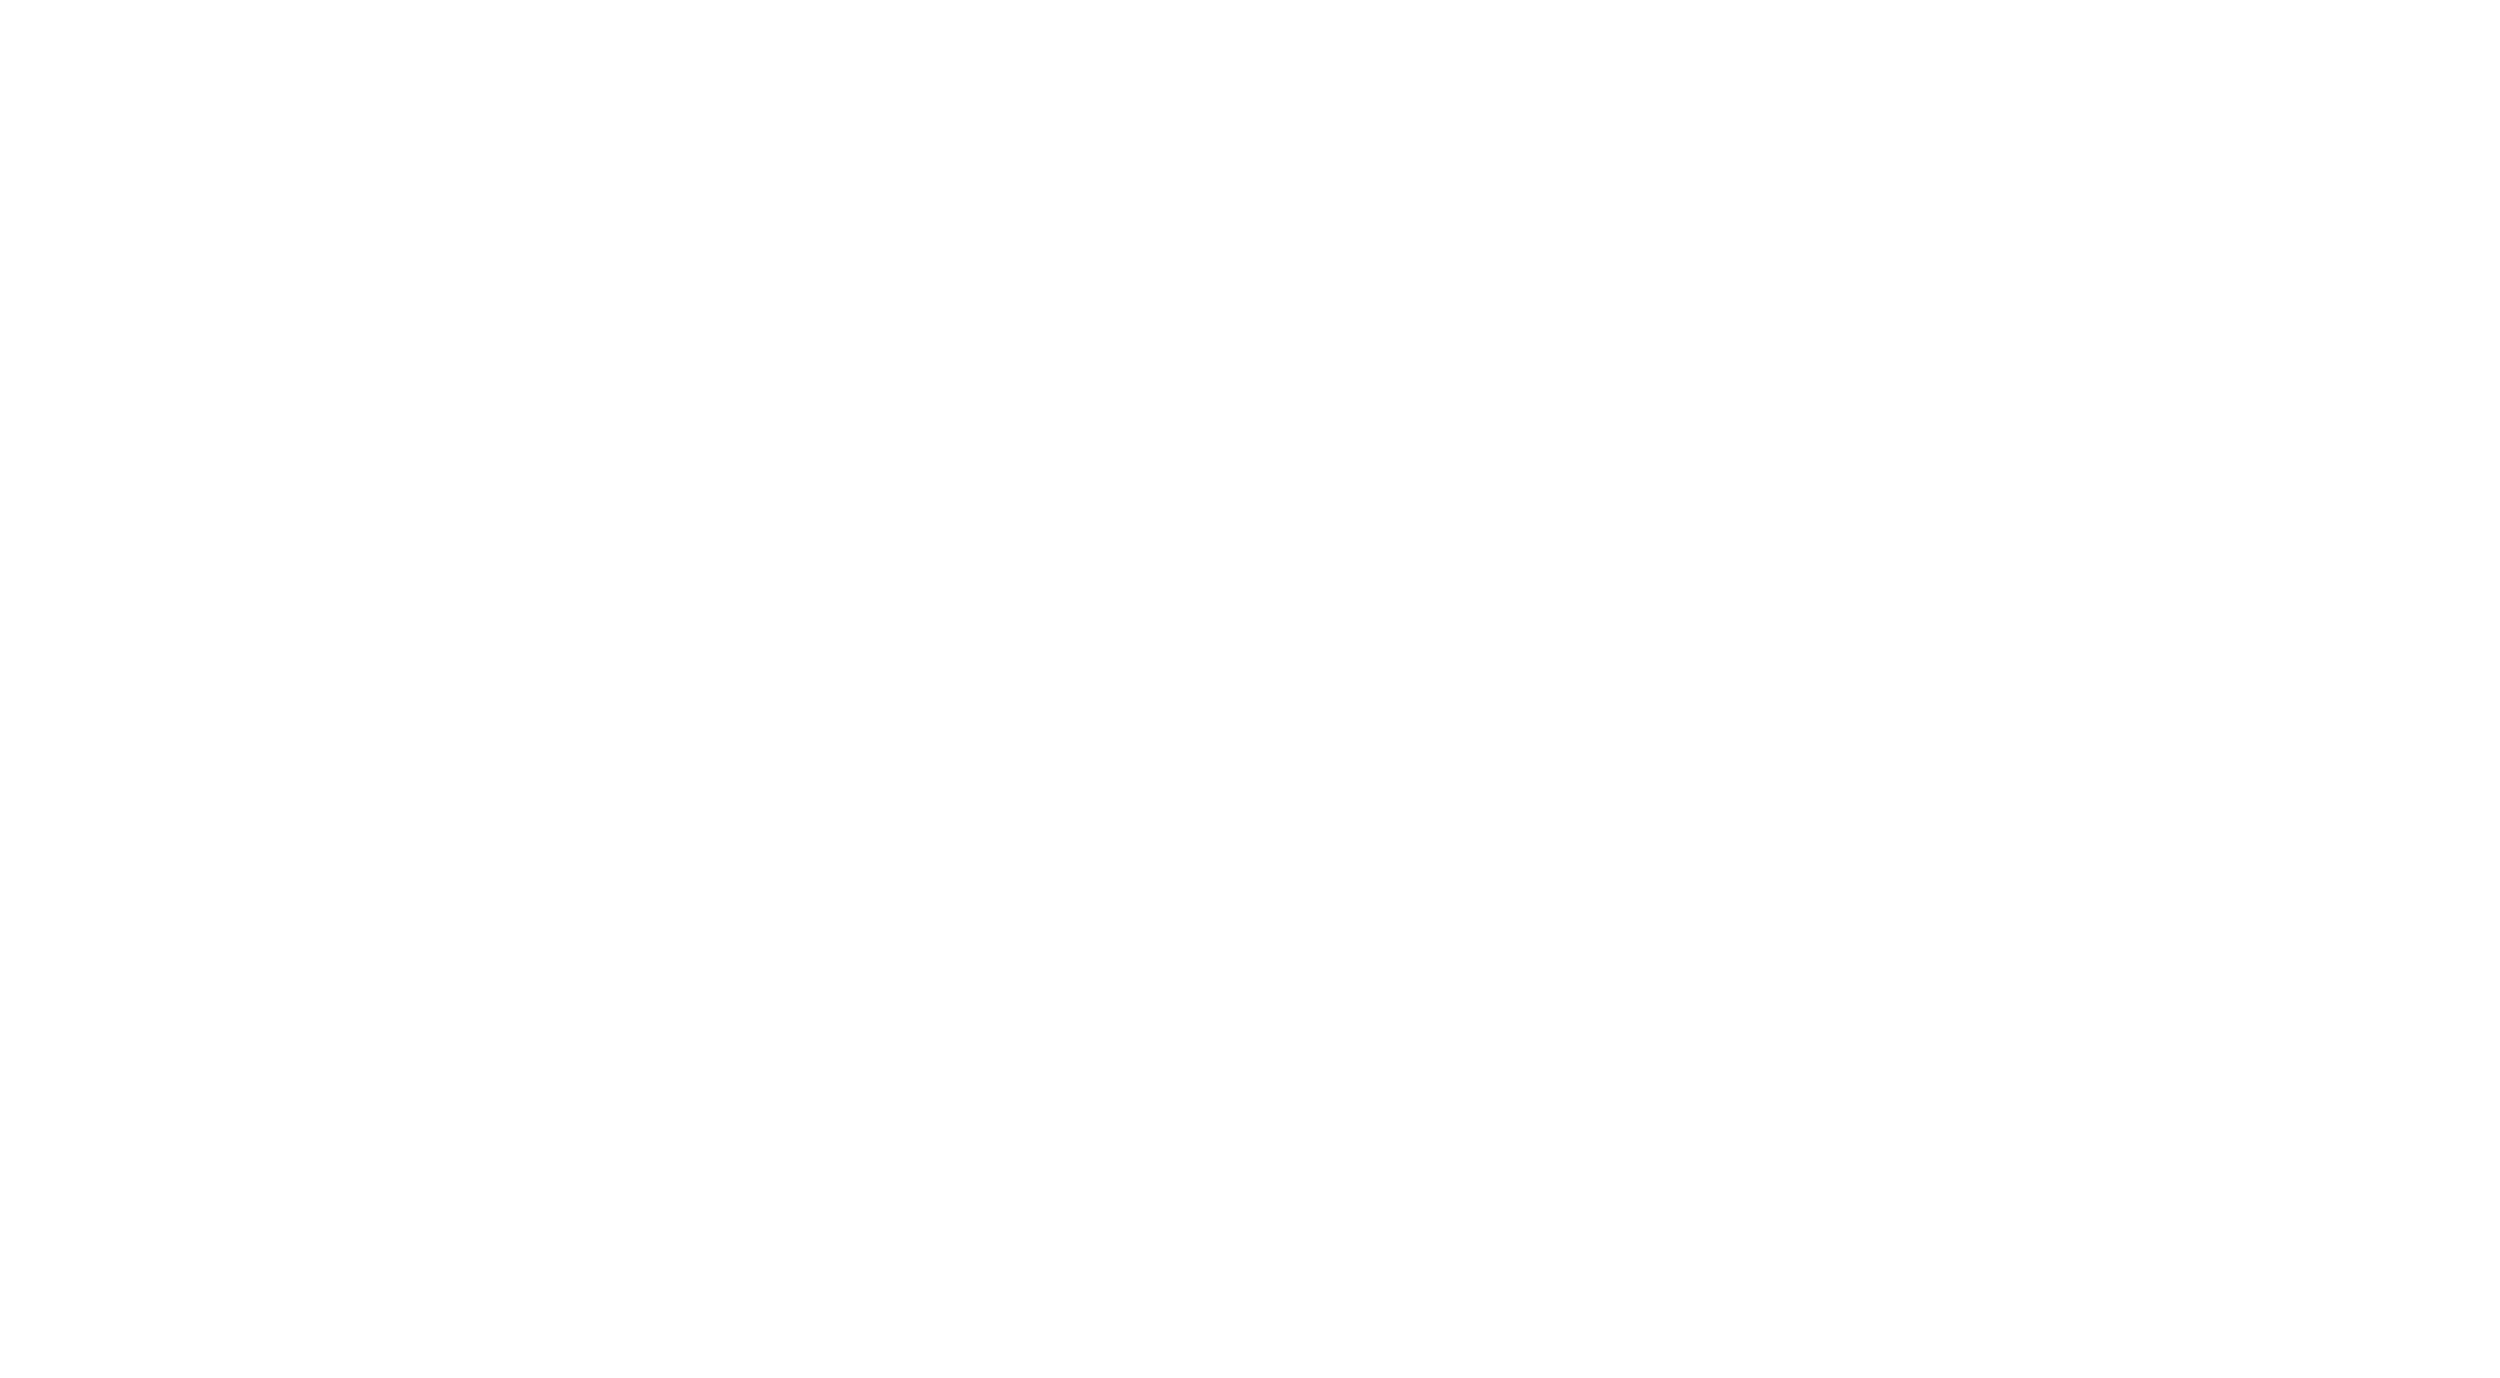 Logo Karlsberger pub in Longyearbyen Svalbard